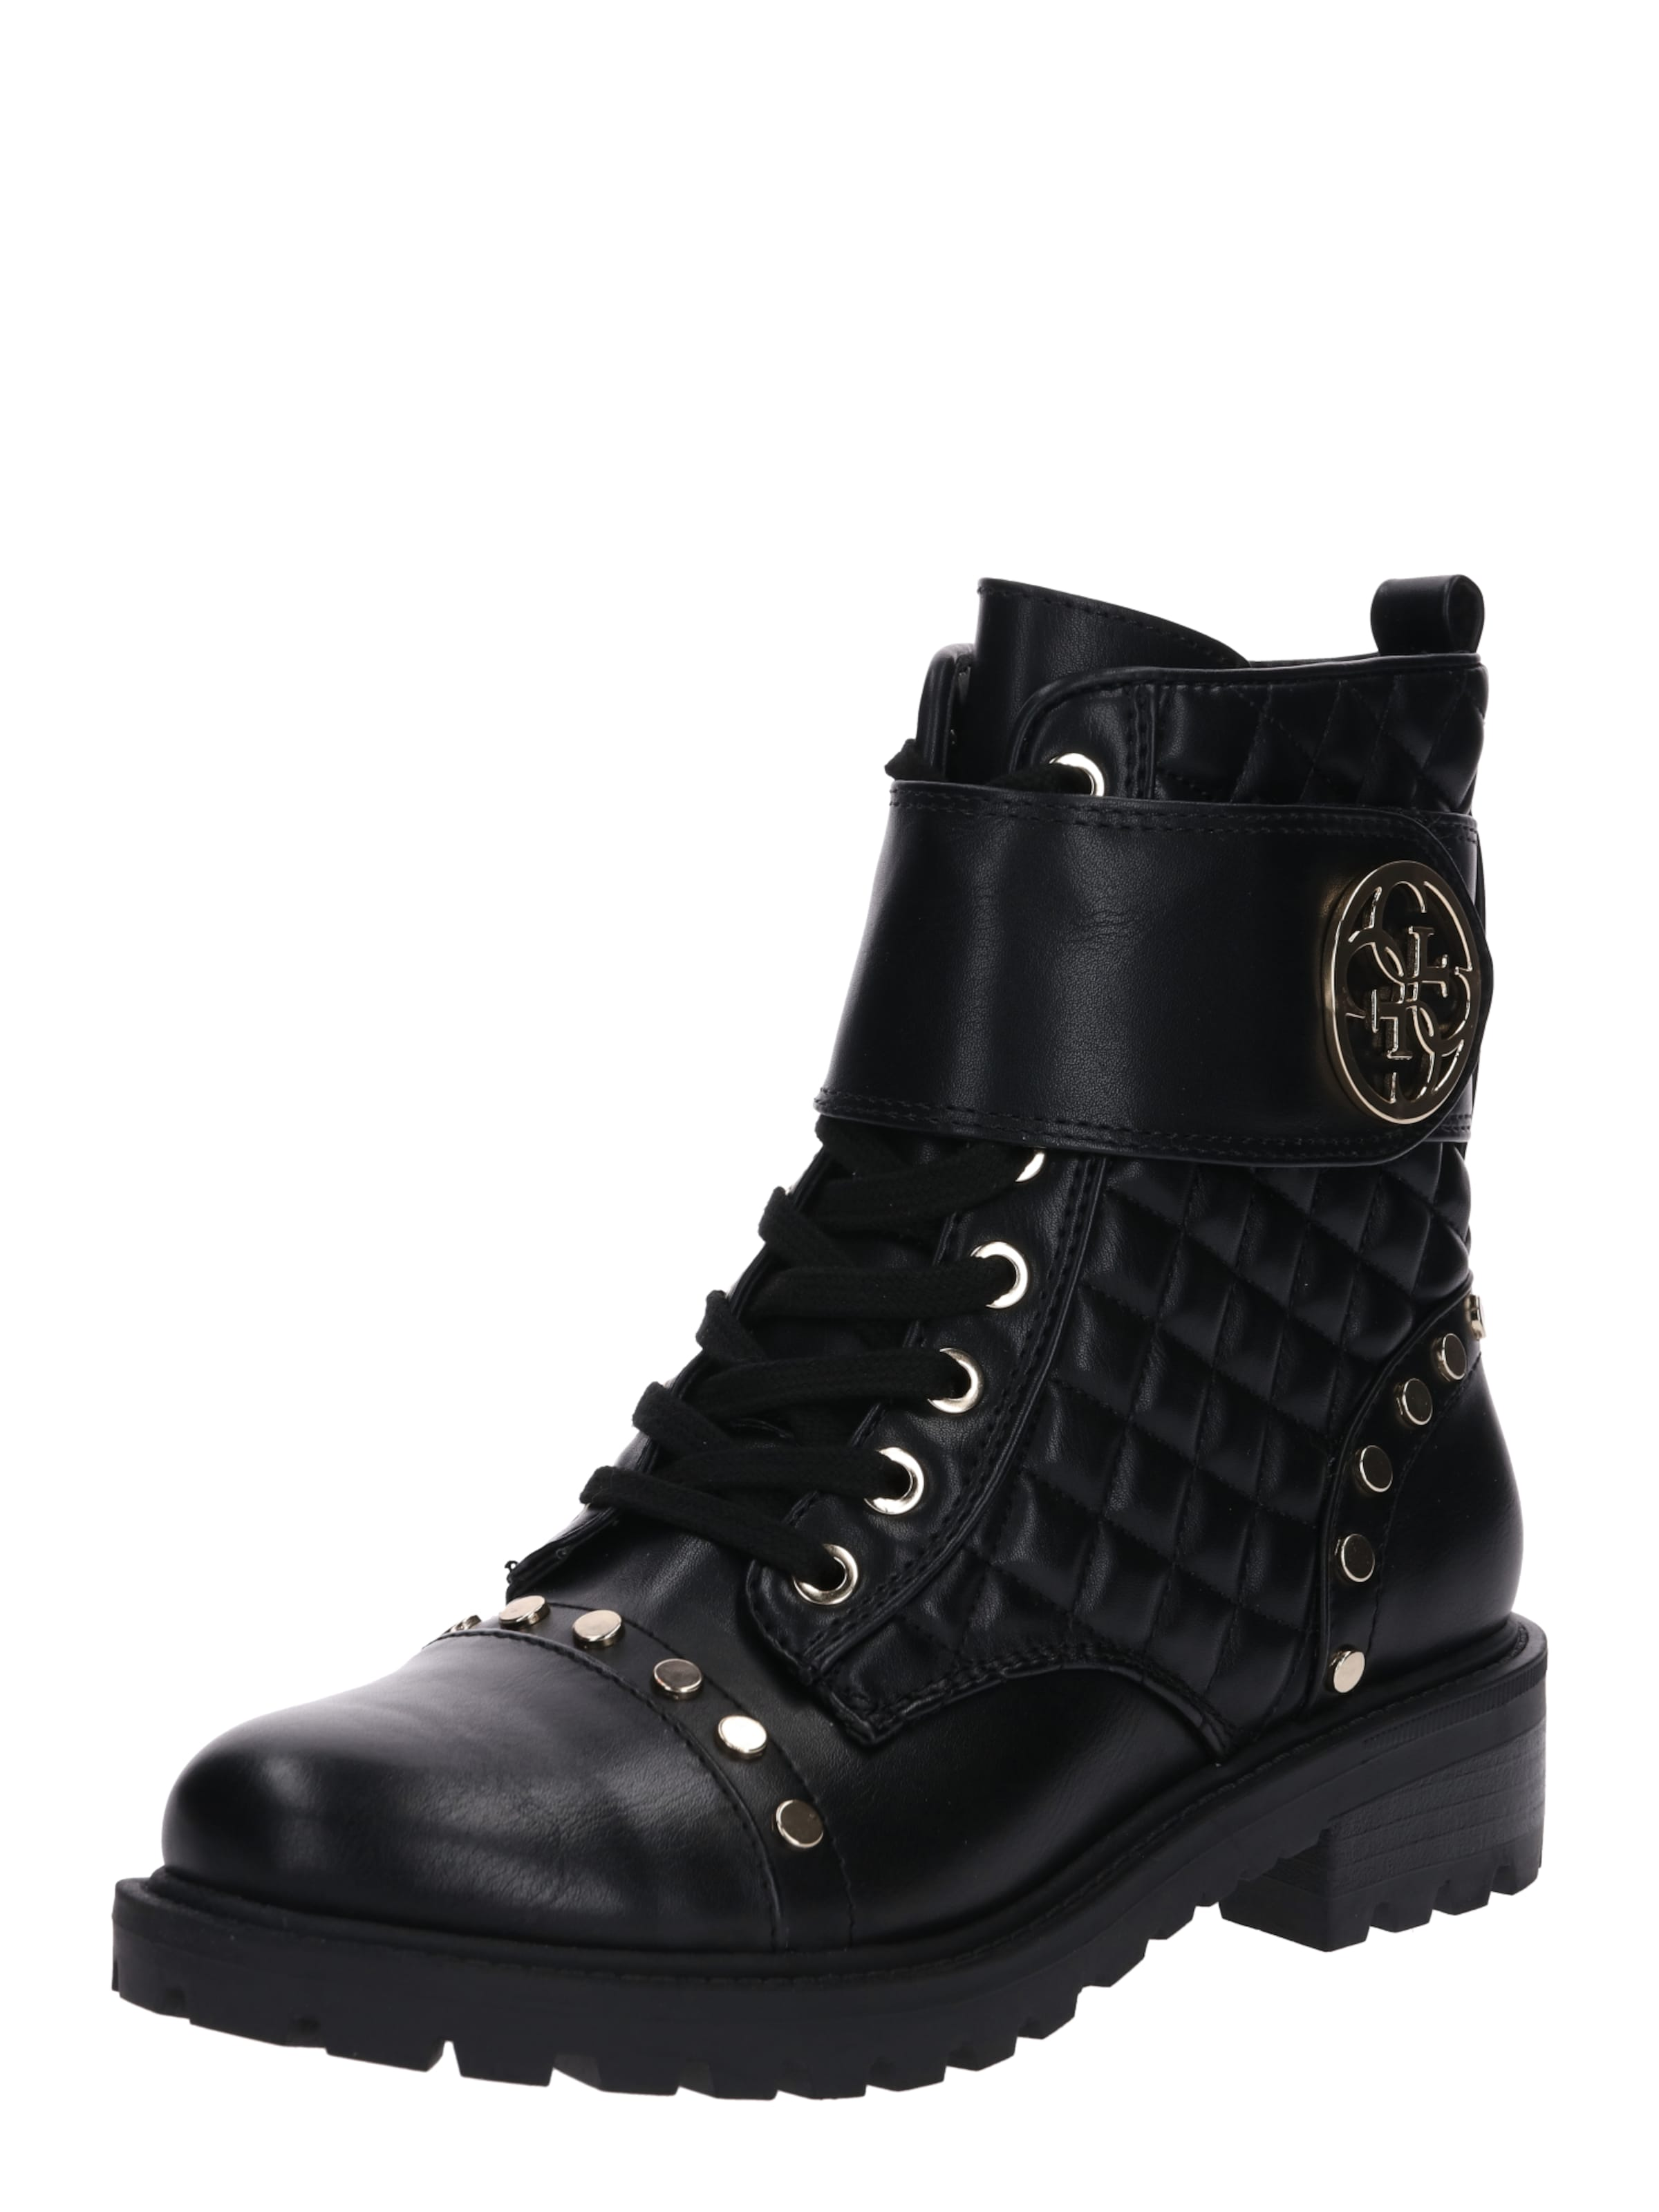 Lea10' Schwarz In 'fl7hea Guess Boots jqARSc543L